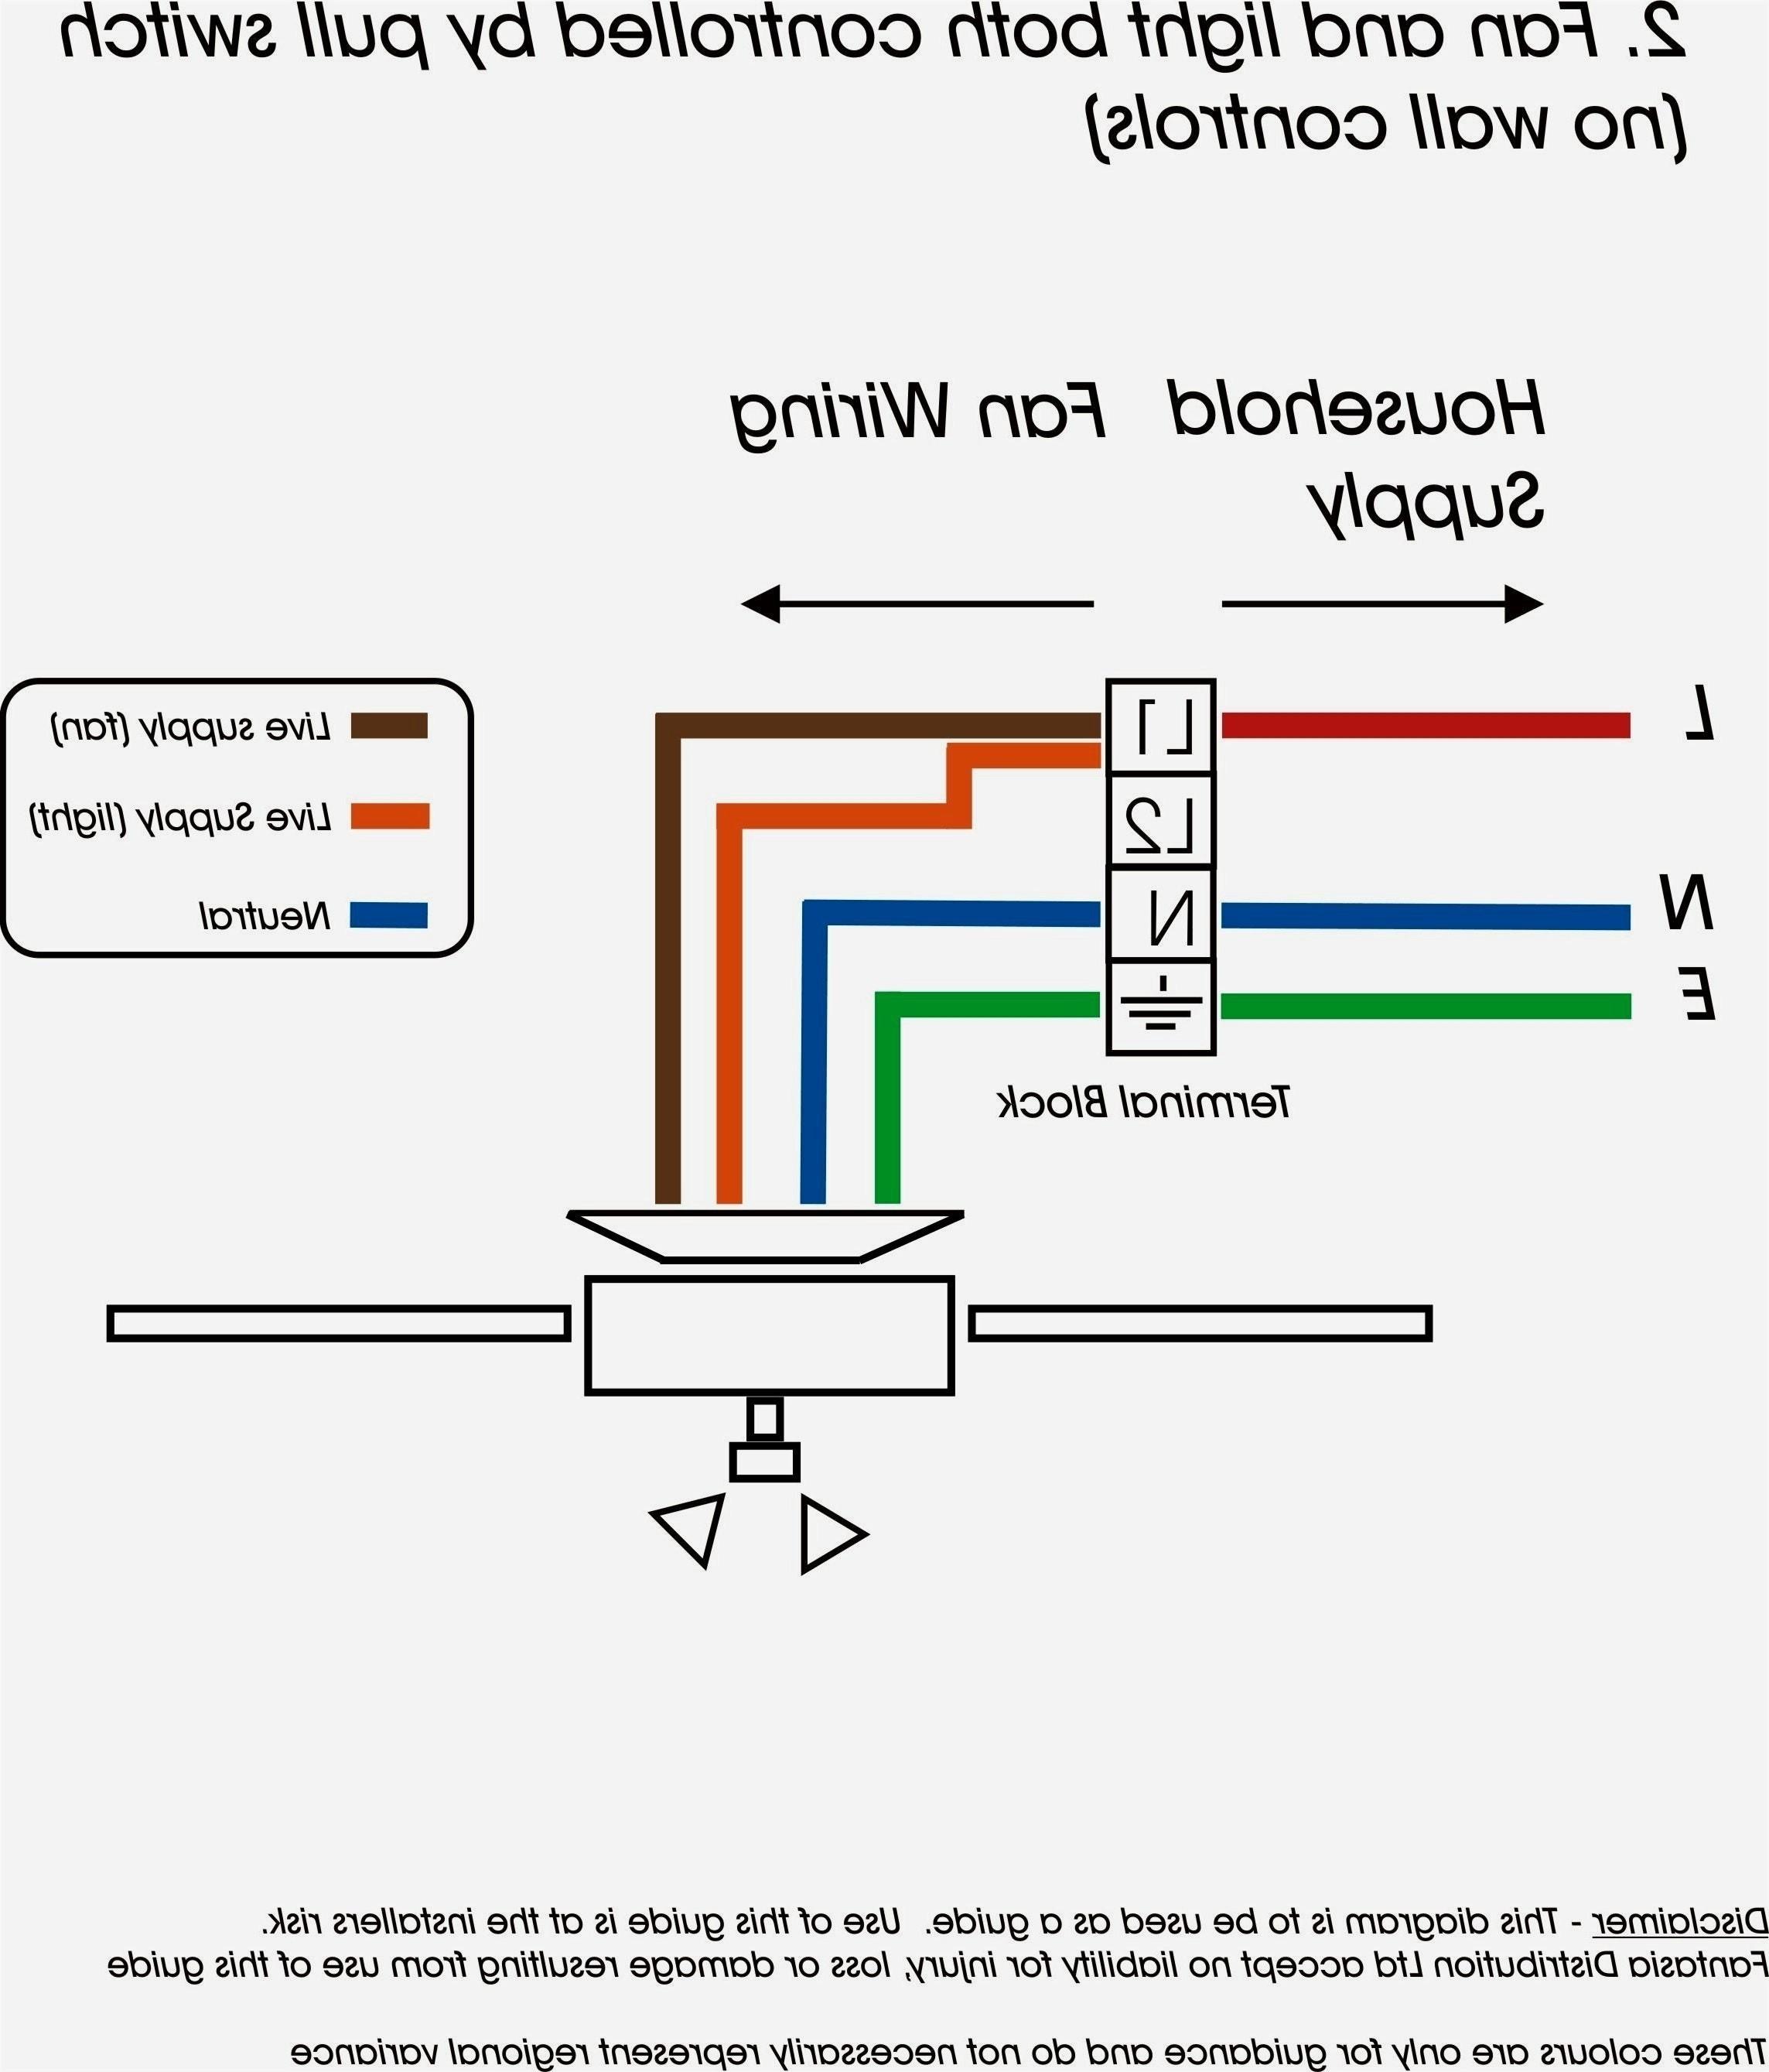 47 Snow Plow Meyer Wiring Diagrams - Wiring Diagram G8 Old Meyers Snow Plow Wiring Schematic on